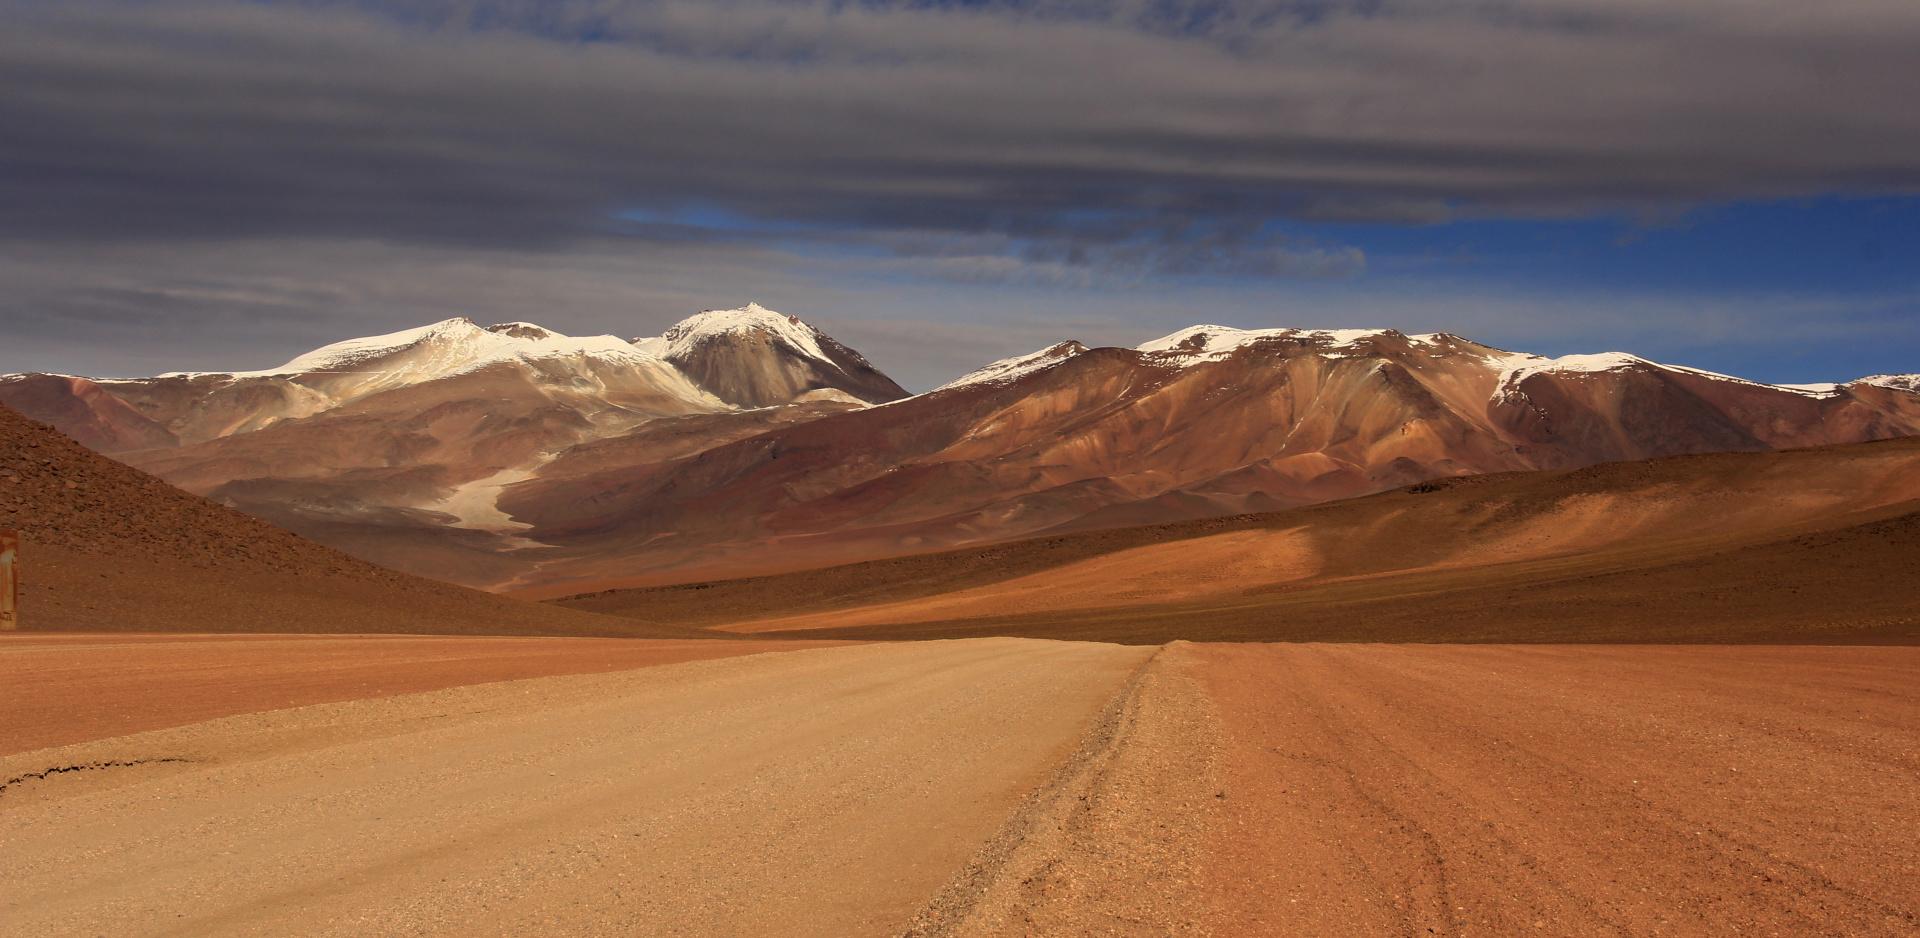 Atacama desert, Bolivia, Chille